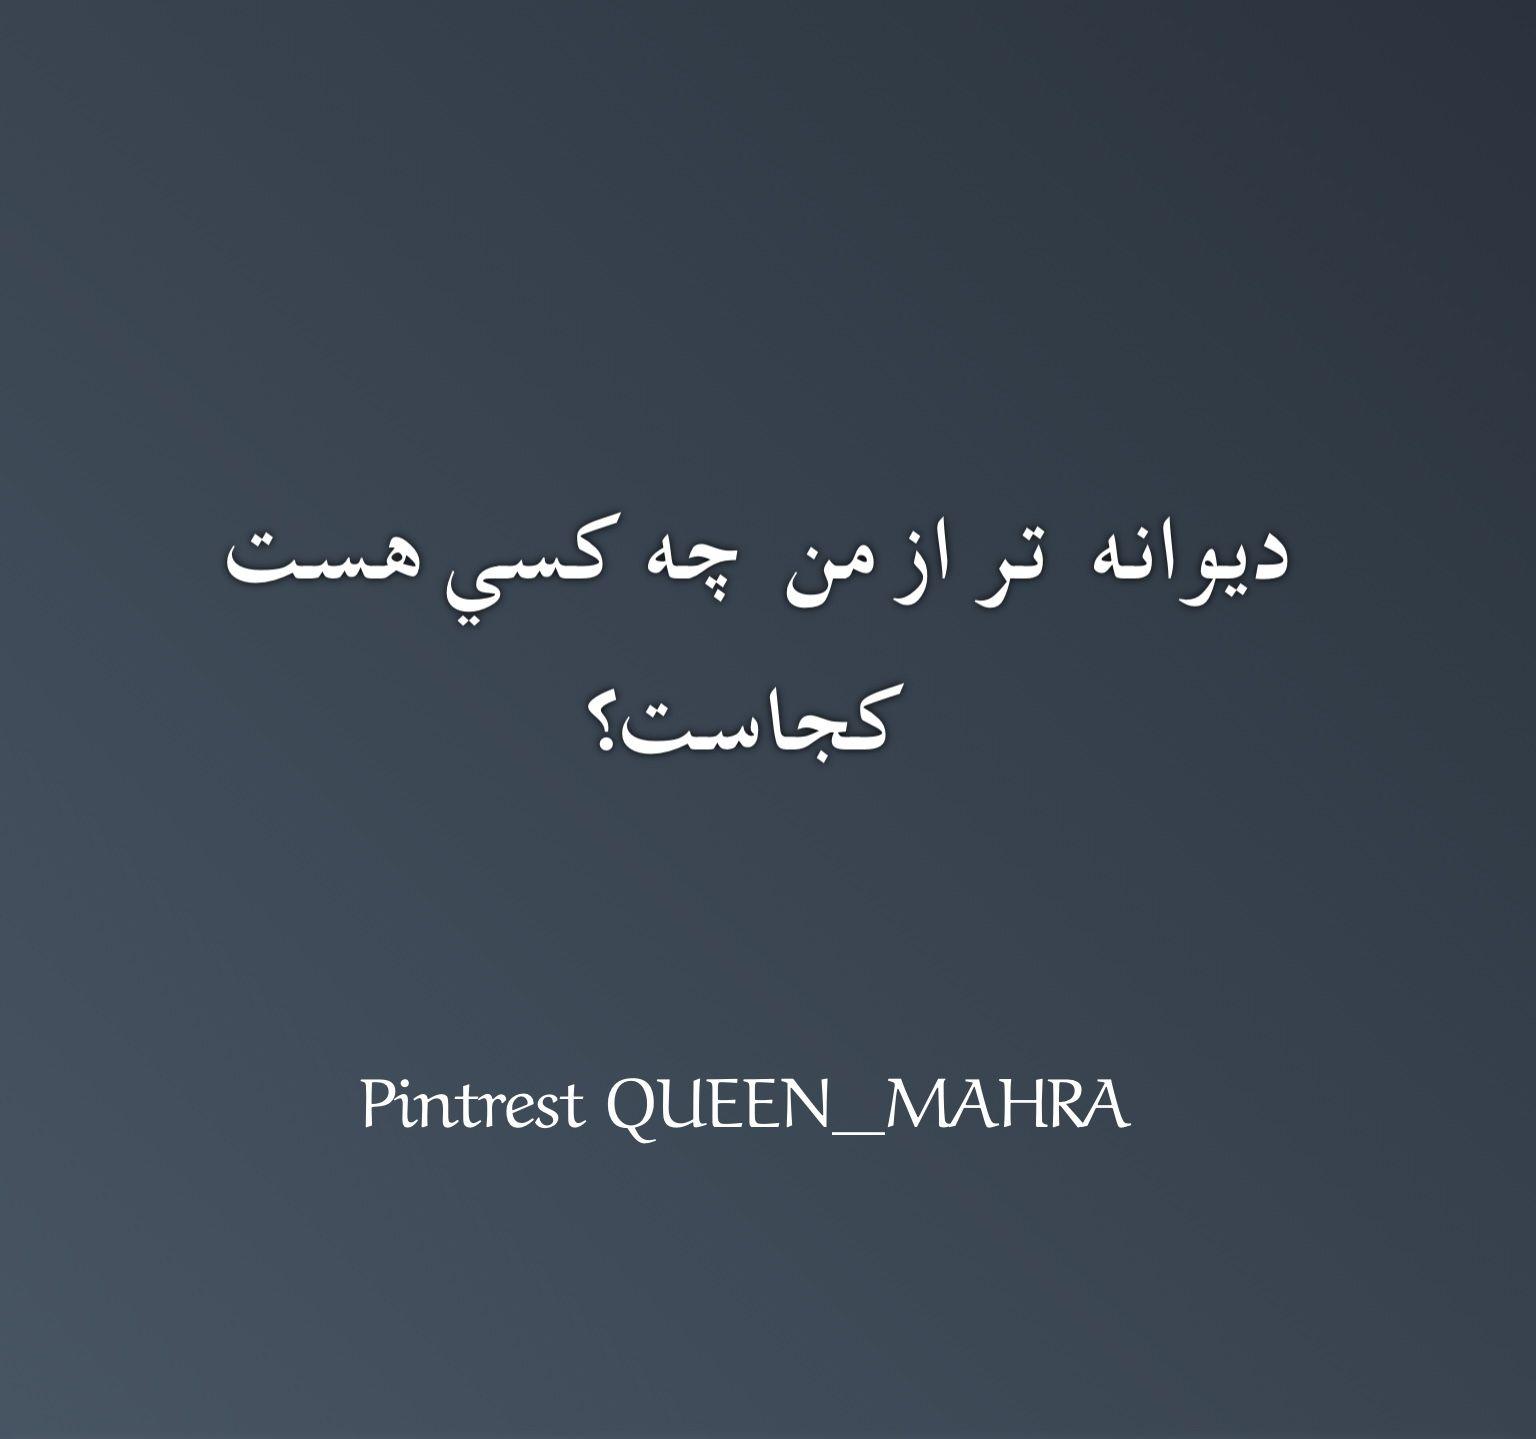 شعر فارسي Pintrest